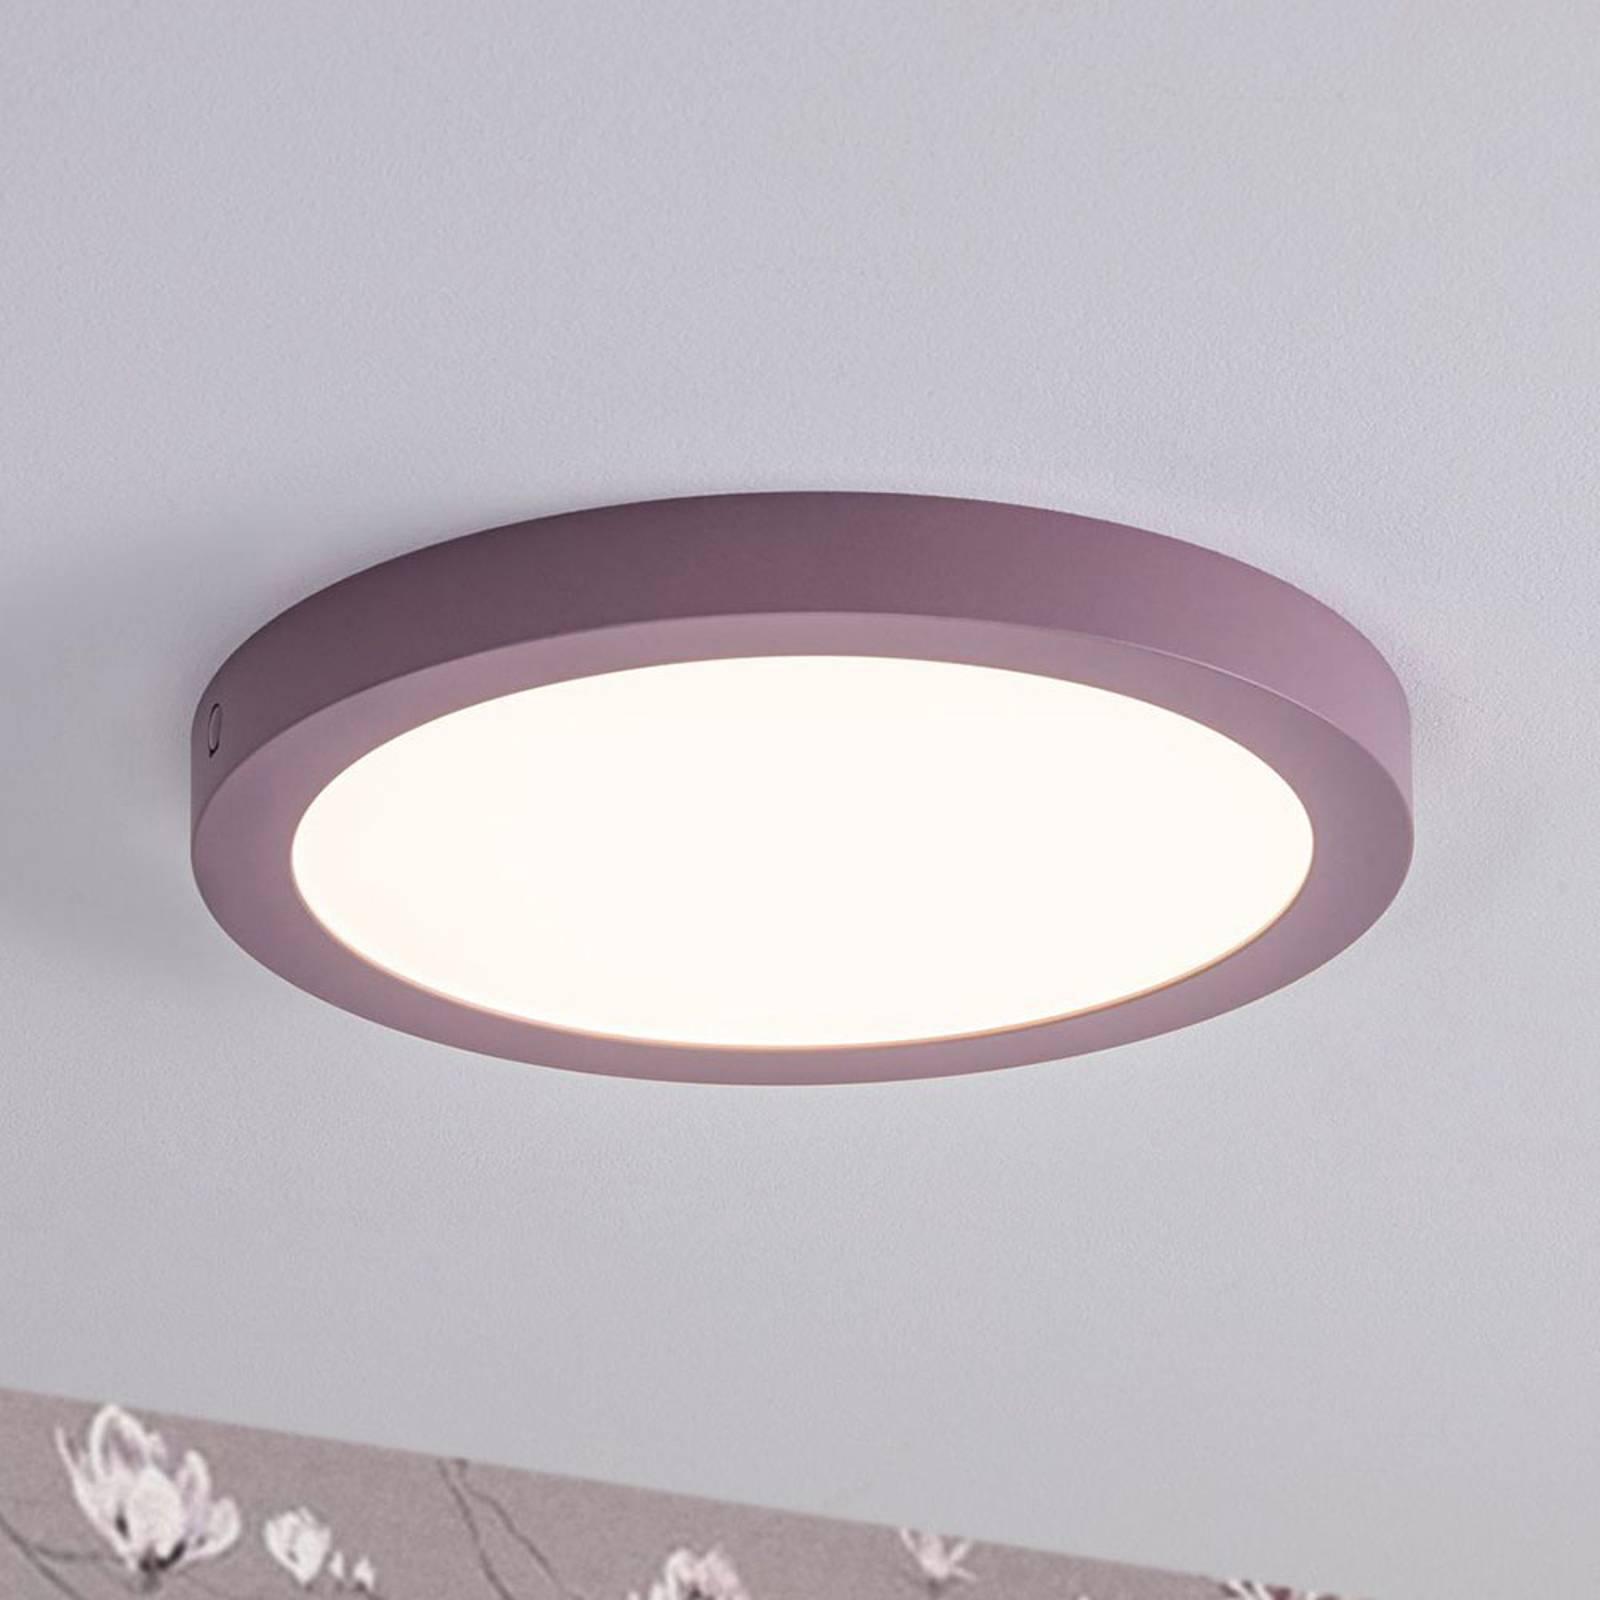 Paulmann-LED-paneeli Abia, pyöreä, Ø 30 cm syreeni